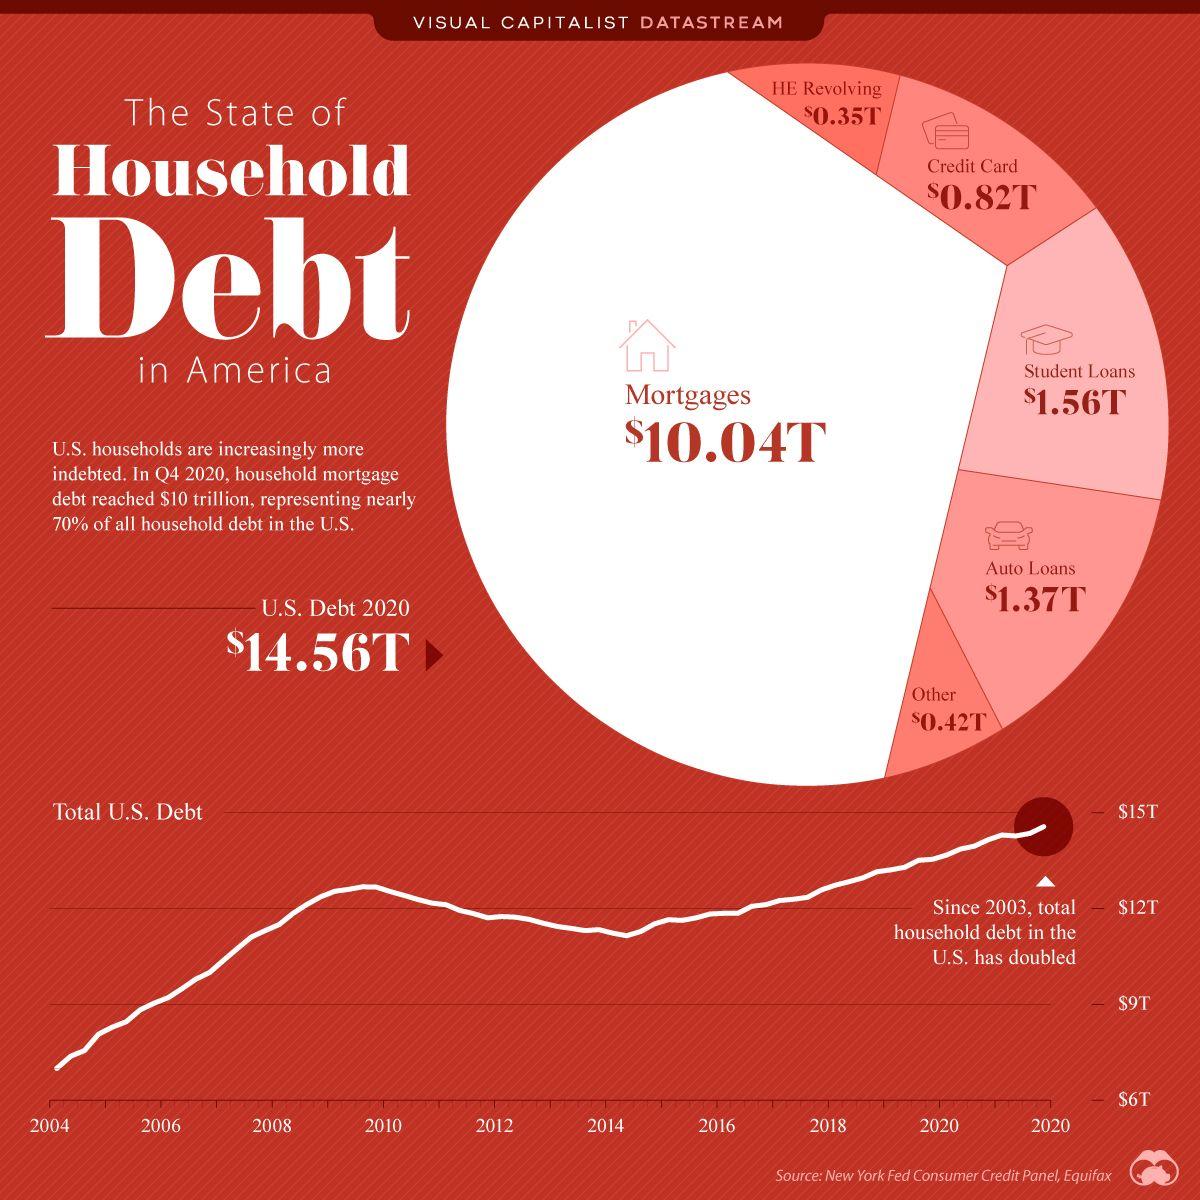 The growing household debt in America